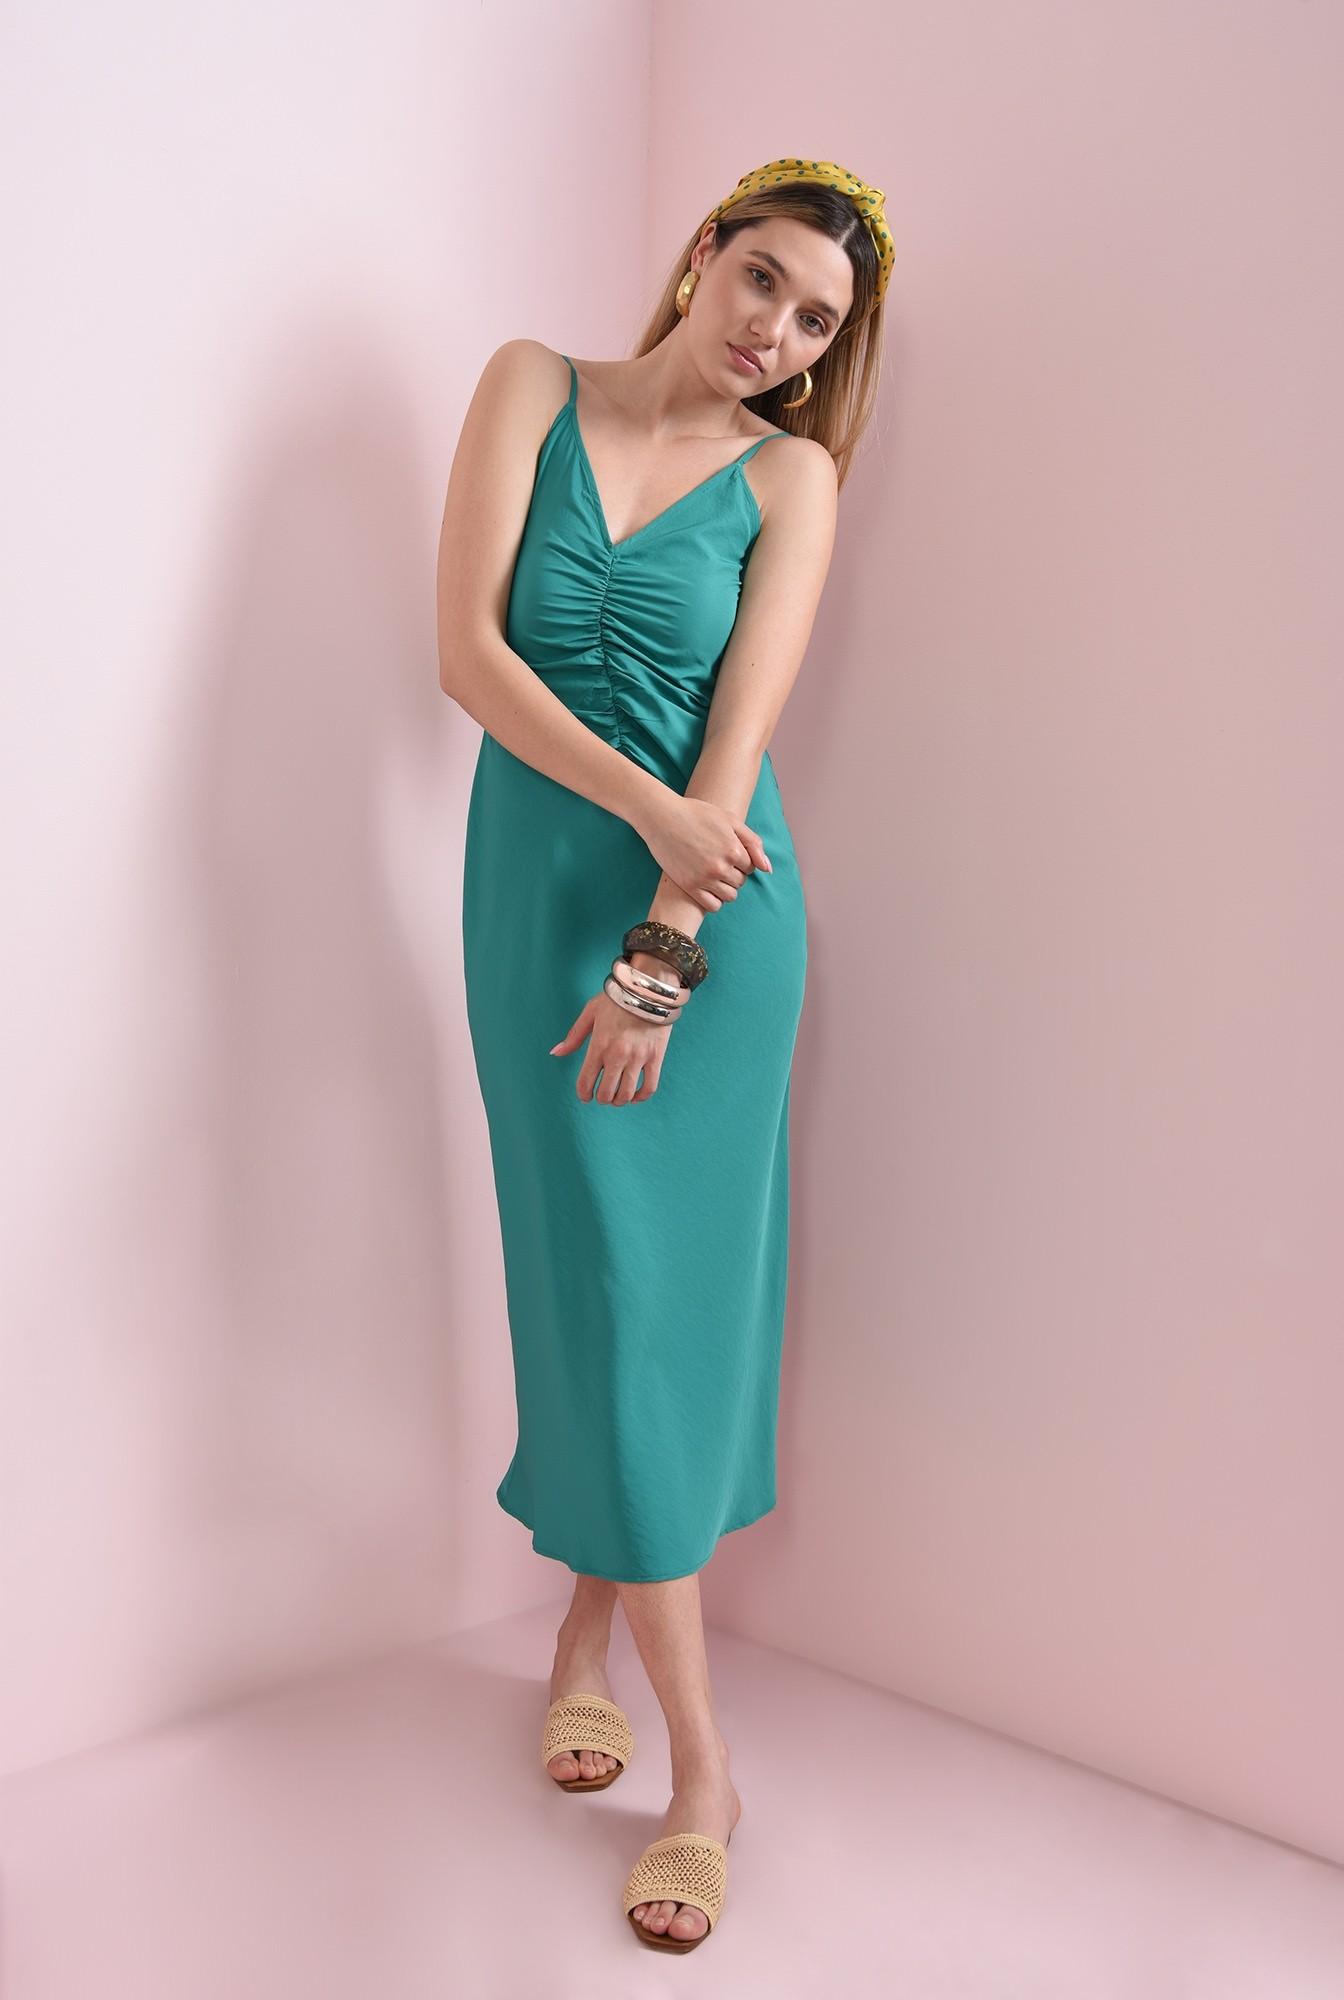 0 - rochie verde, midi, cu bretele